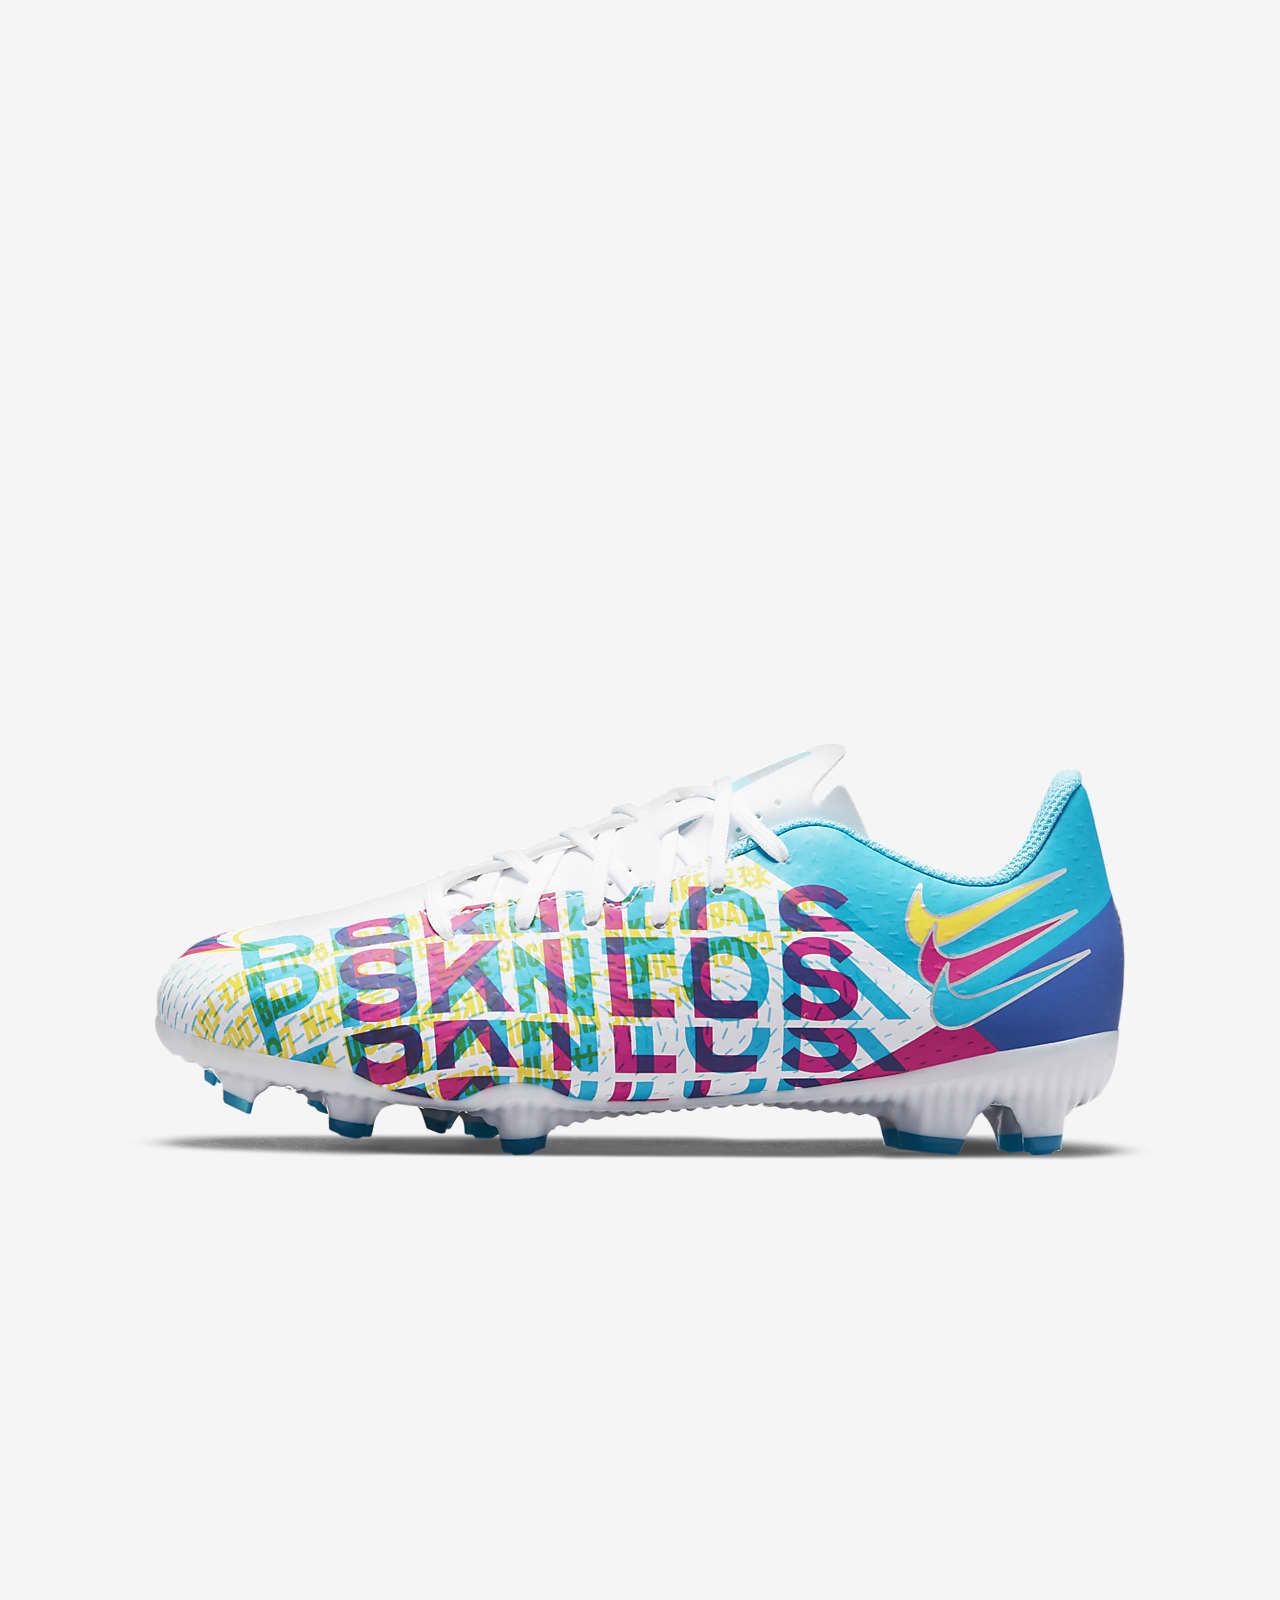 Nike Jr. Phantom GT Academy 3D MG Younger/Older Kids' Multi-Ground Football Boots